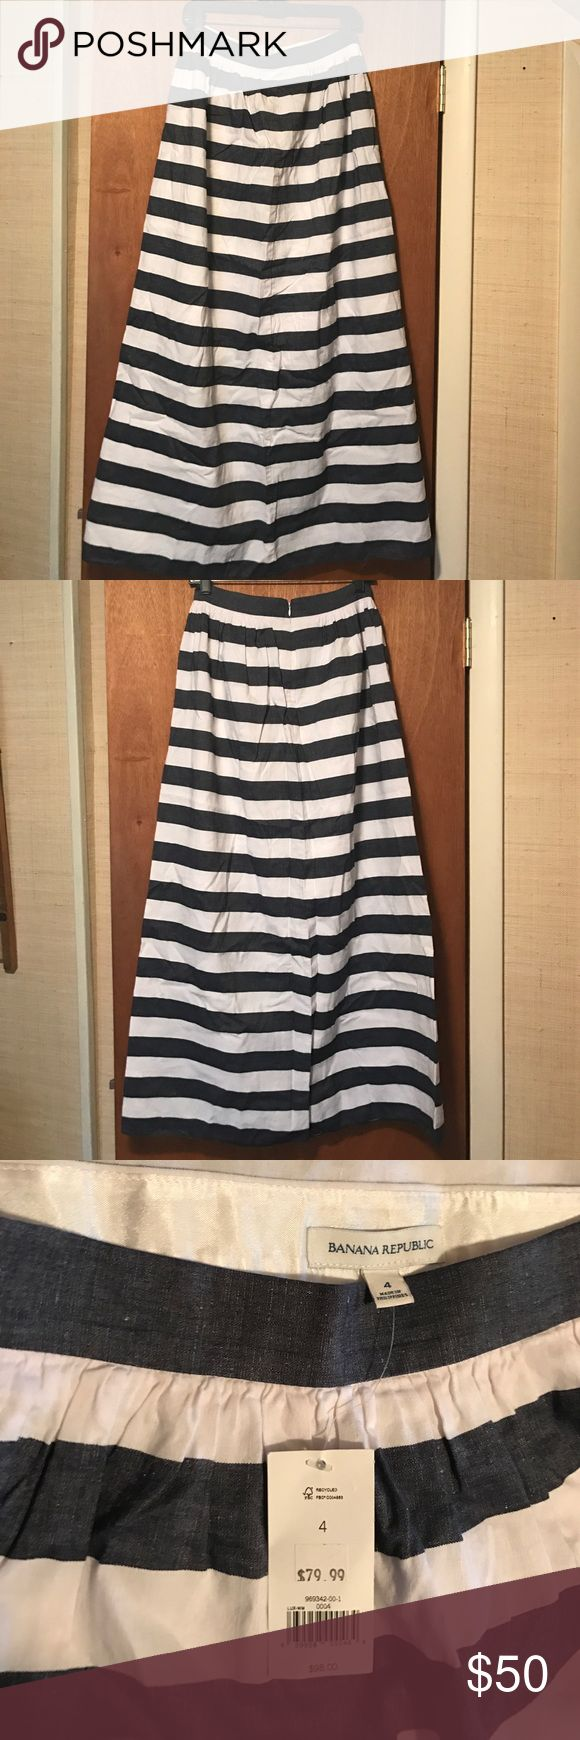 NEW Banana Republic Maxi Skirt Stripe Size 4 Banana Republic Maxi Skirt Blue and White Stripe *Size 4* Brand New! Banana Republic Skirts Maxi